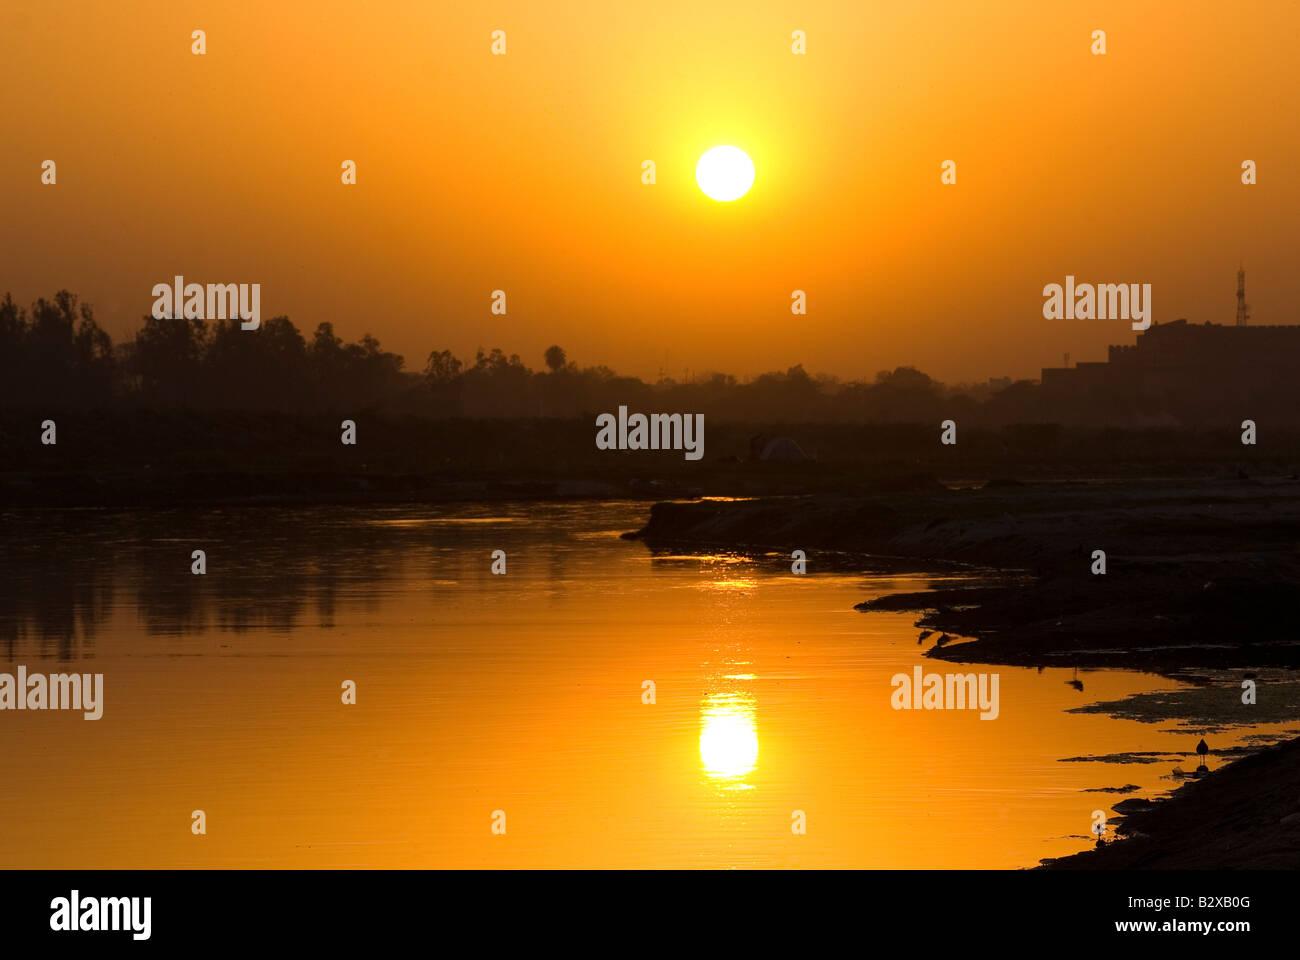 Sunset over Yamuna River, Agra, Uttar Pradesh, India, Subcontinent, Asia - Stock Image